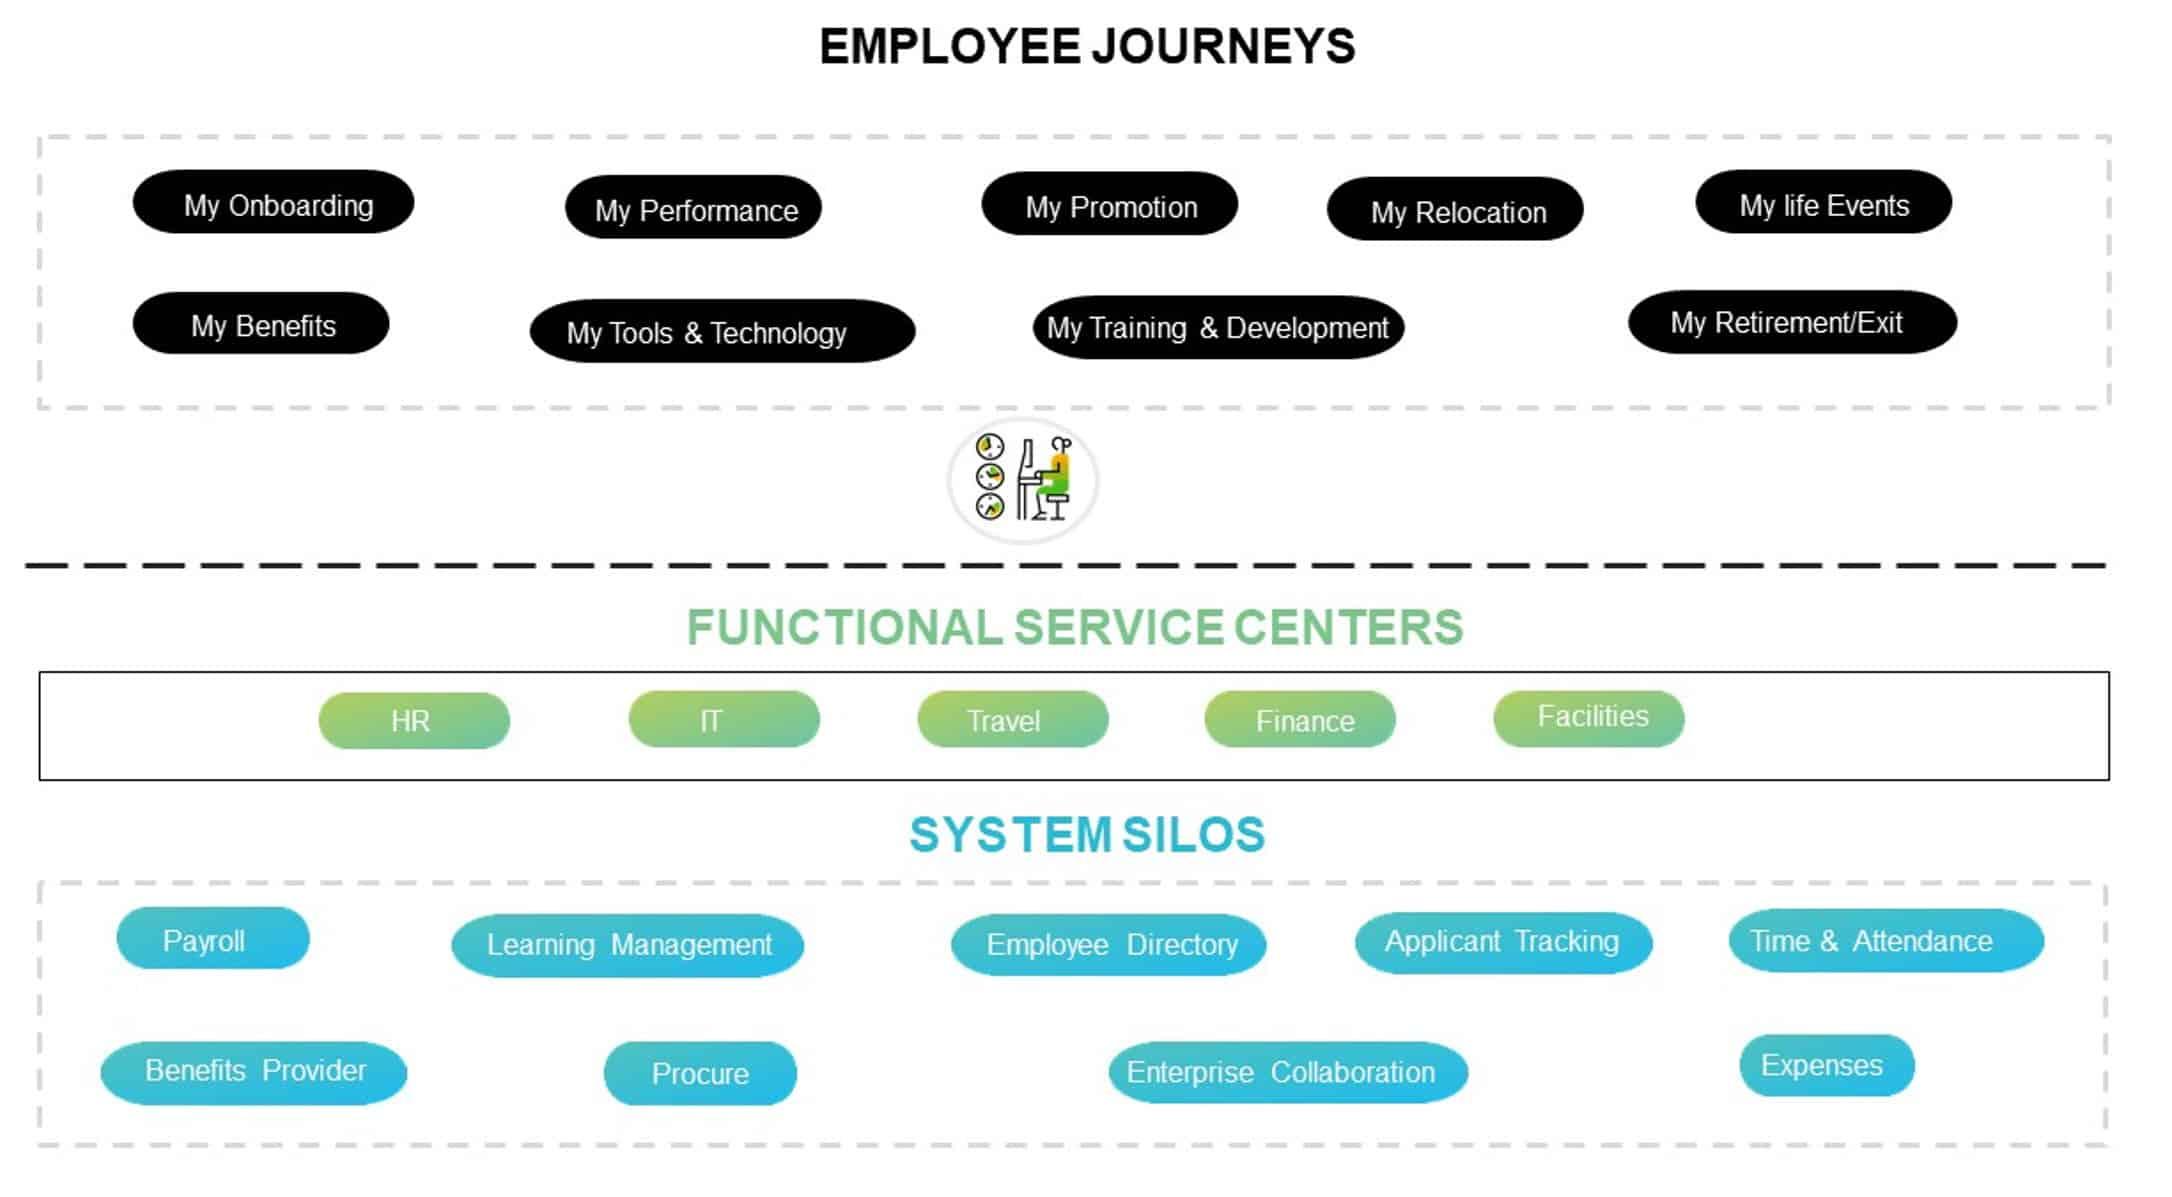 Employee Journey 2 Enhance Employee Experience with SAP SuccessFactors Work Zone